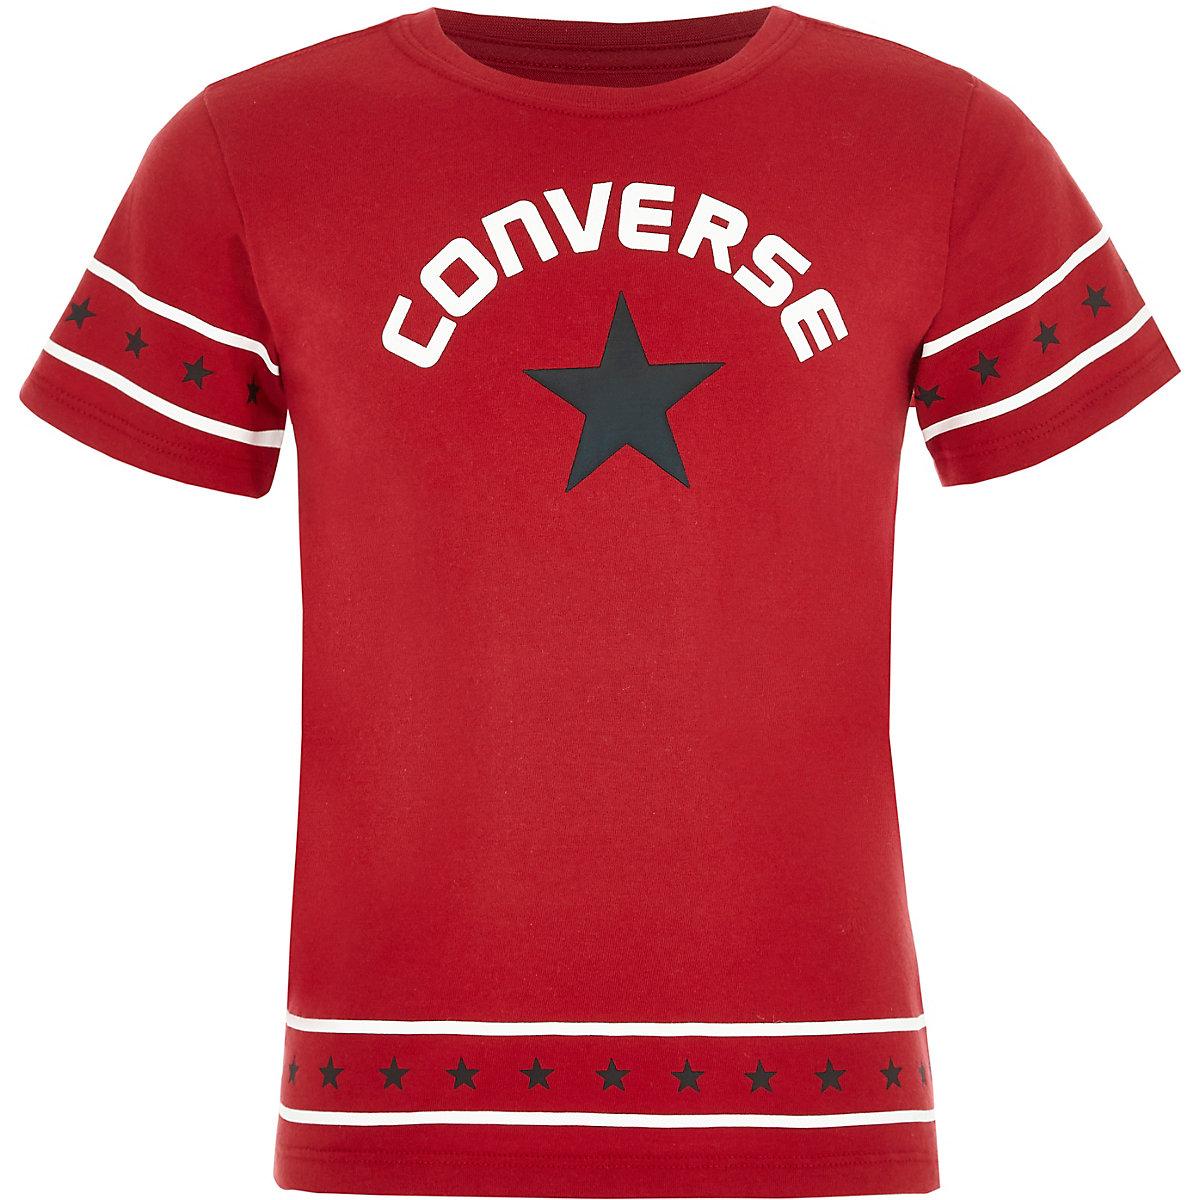 Girls Converse red star trim T-shirt